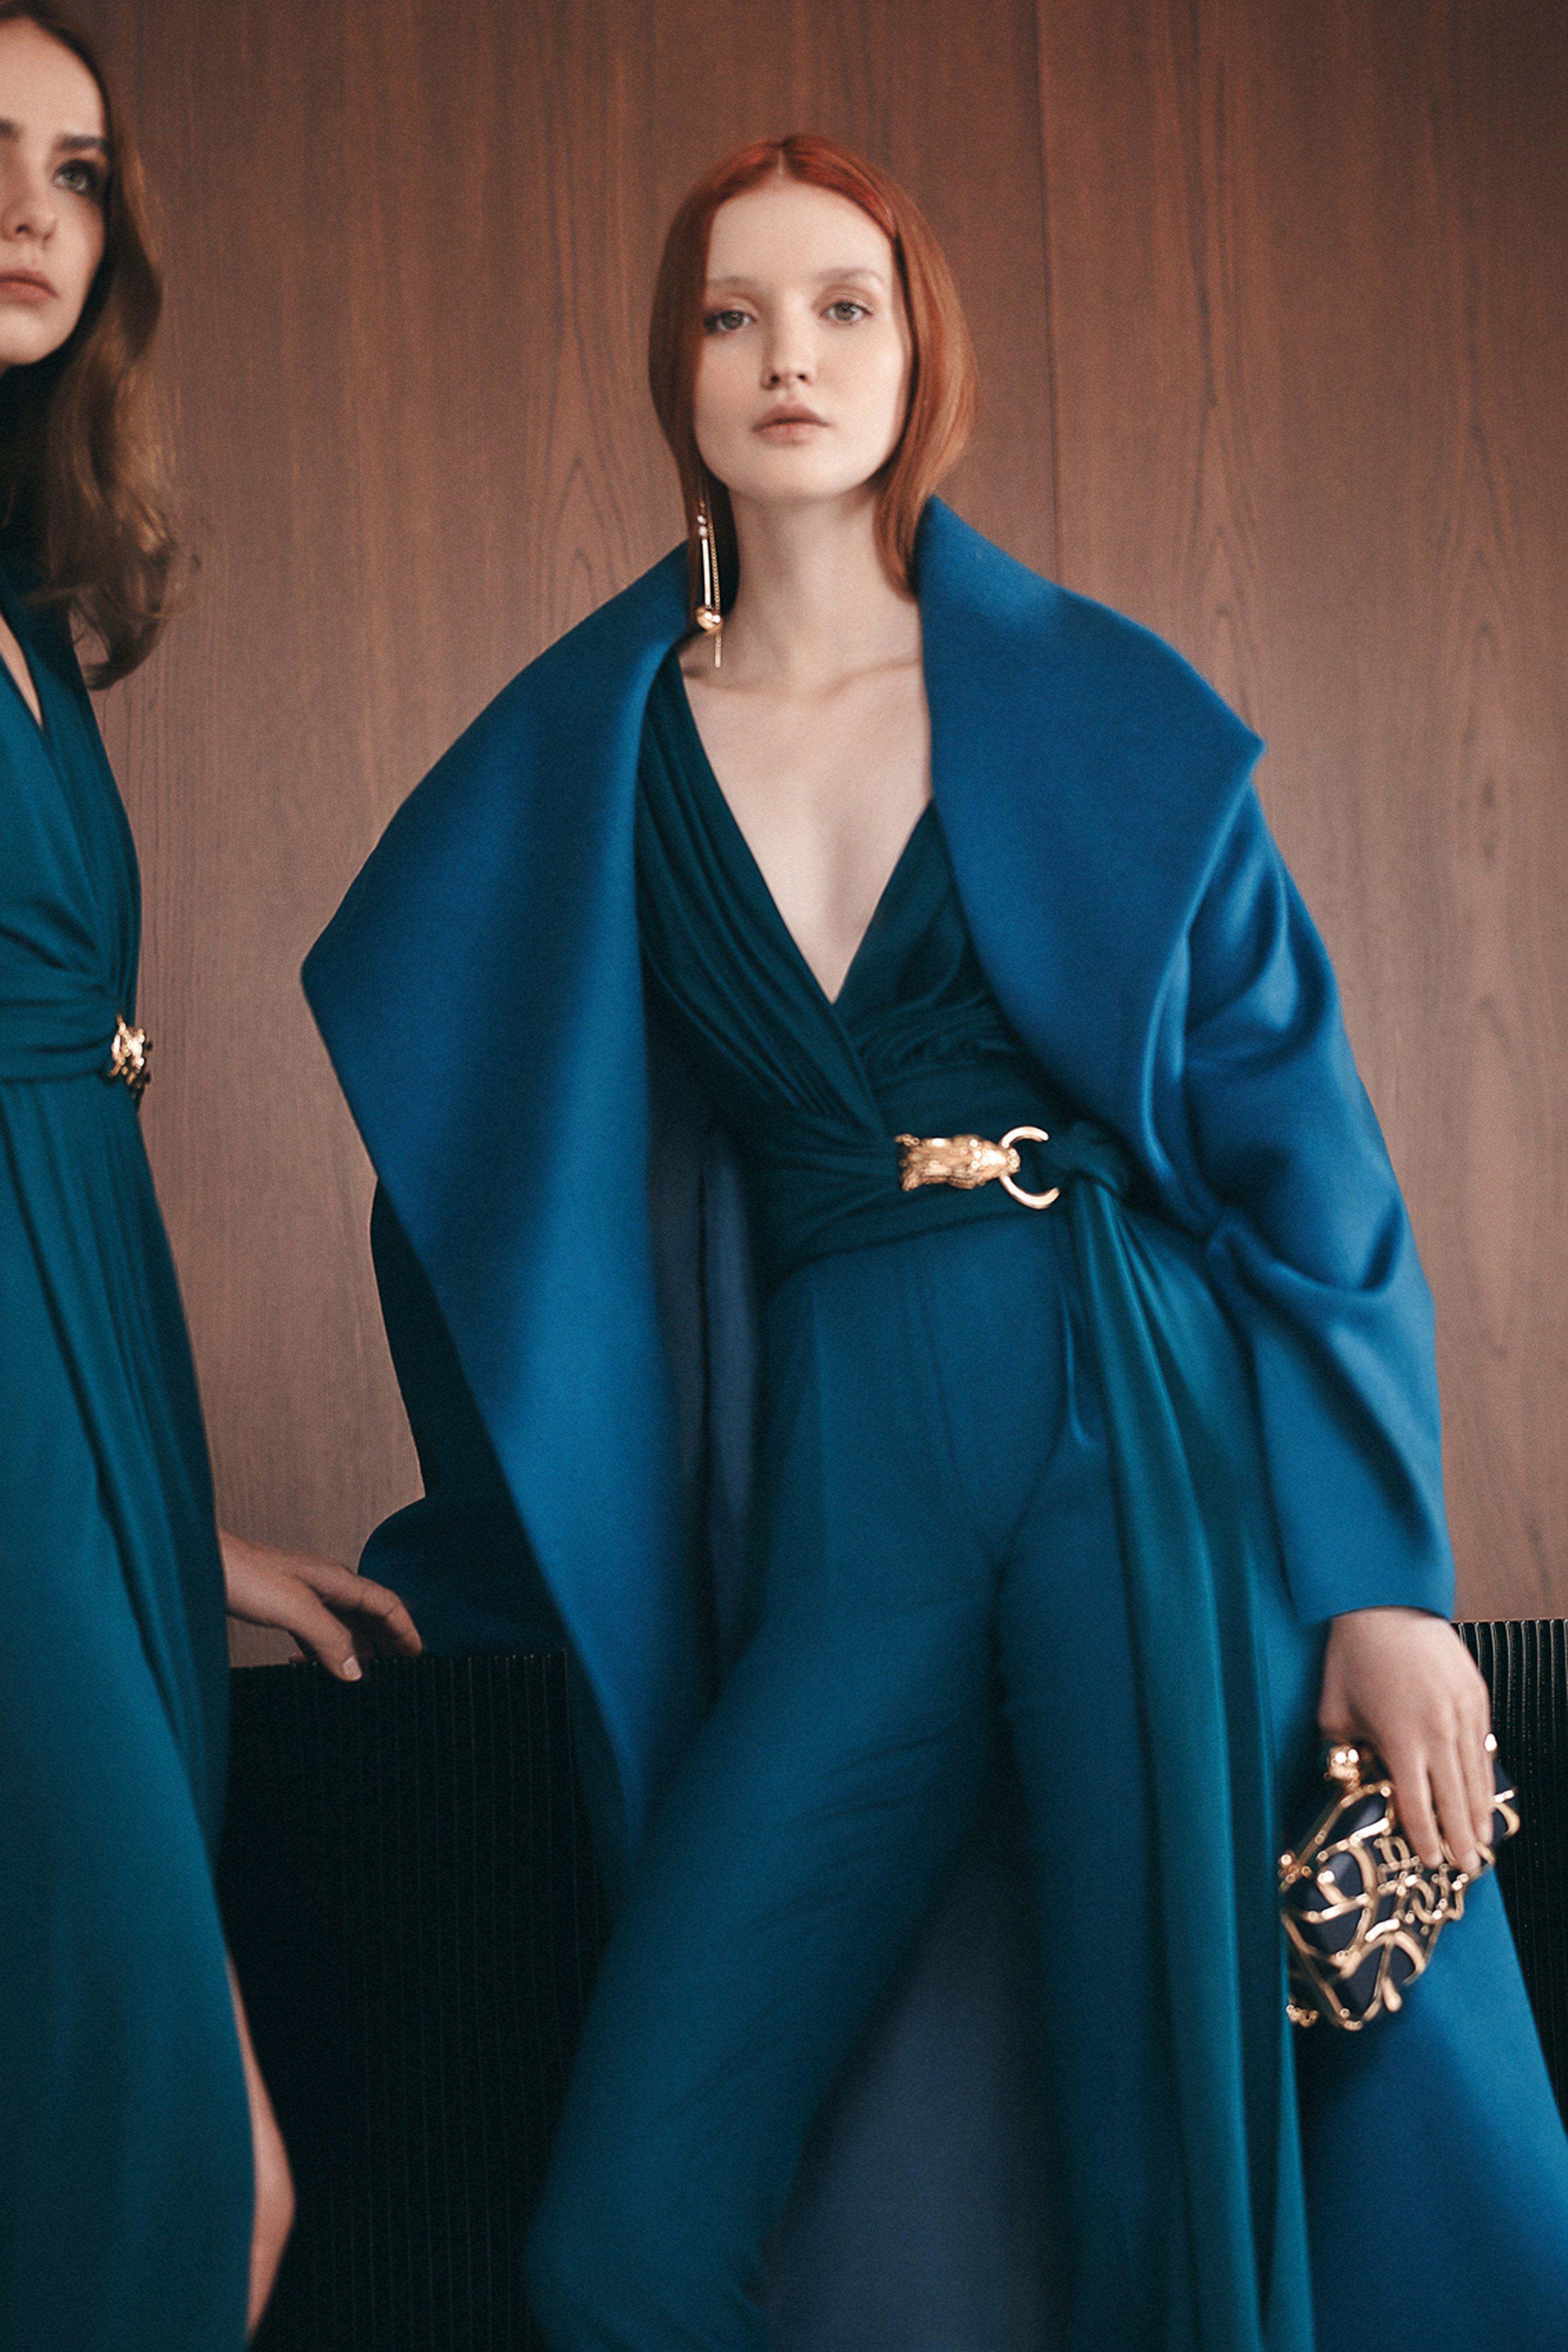 Elie Saab Pre-Fall 2019 Fashion Show #2019fallfashiontrends